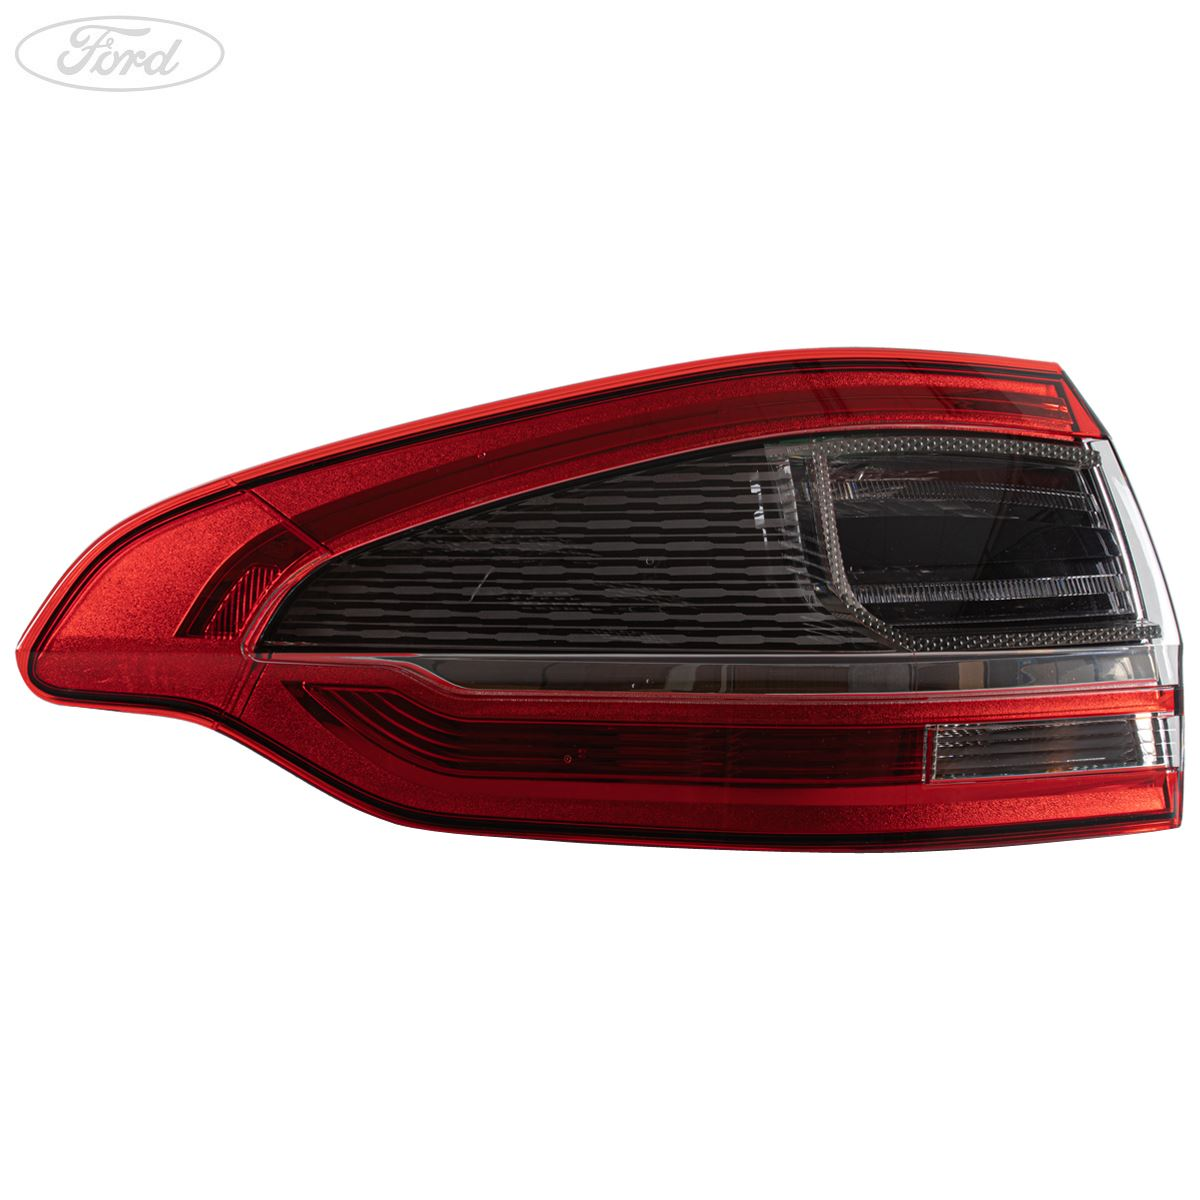 Genuine Ford S-Max WA6 Inner Left Rear N//S Light Tail Lamp Cluster 1747111